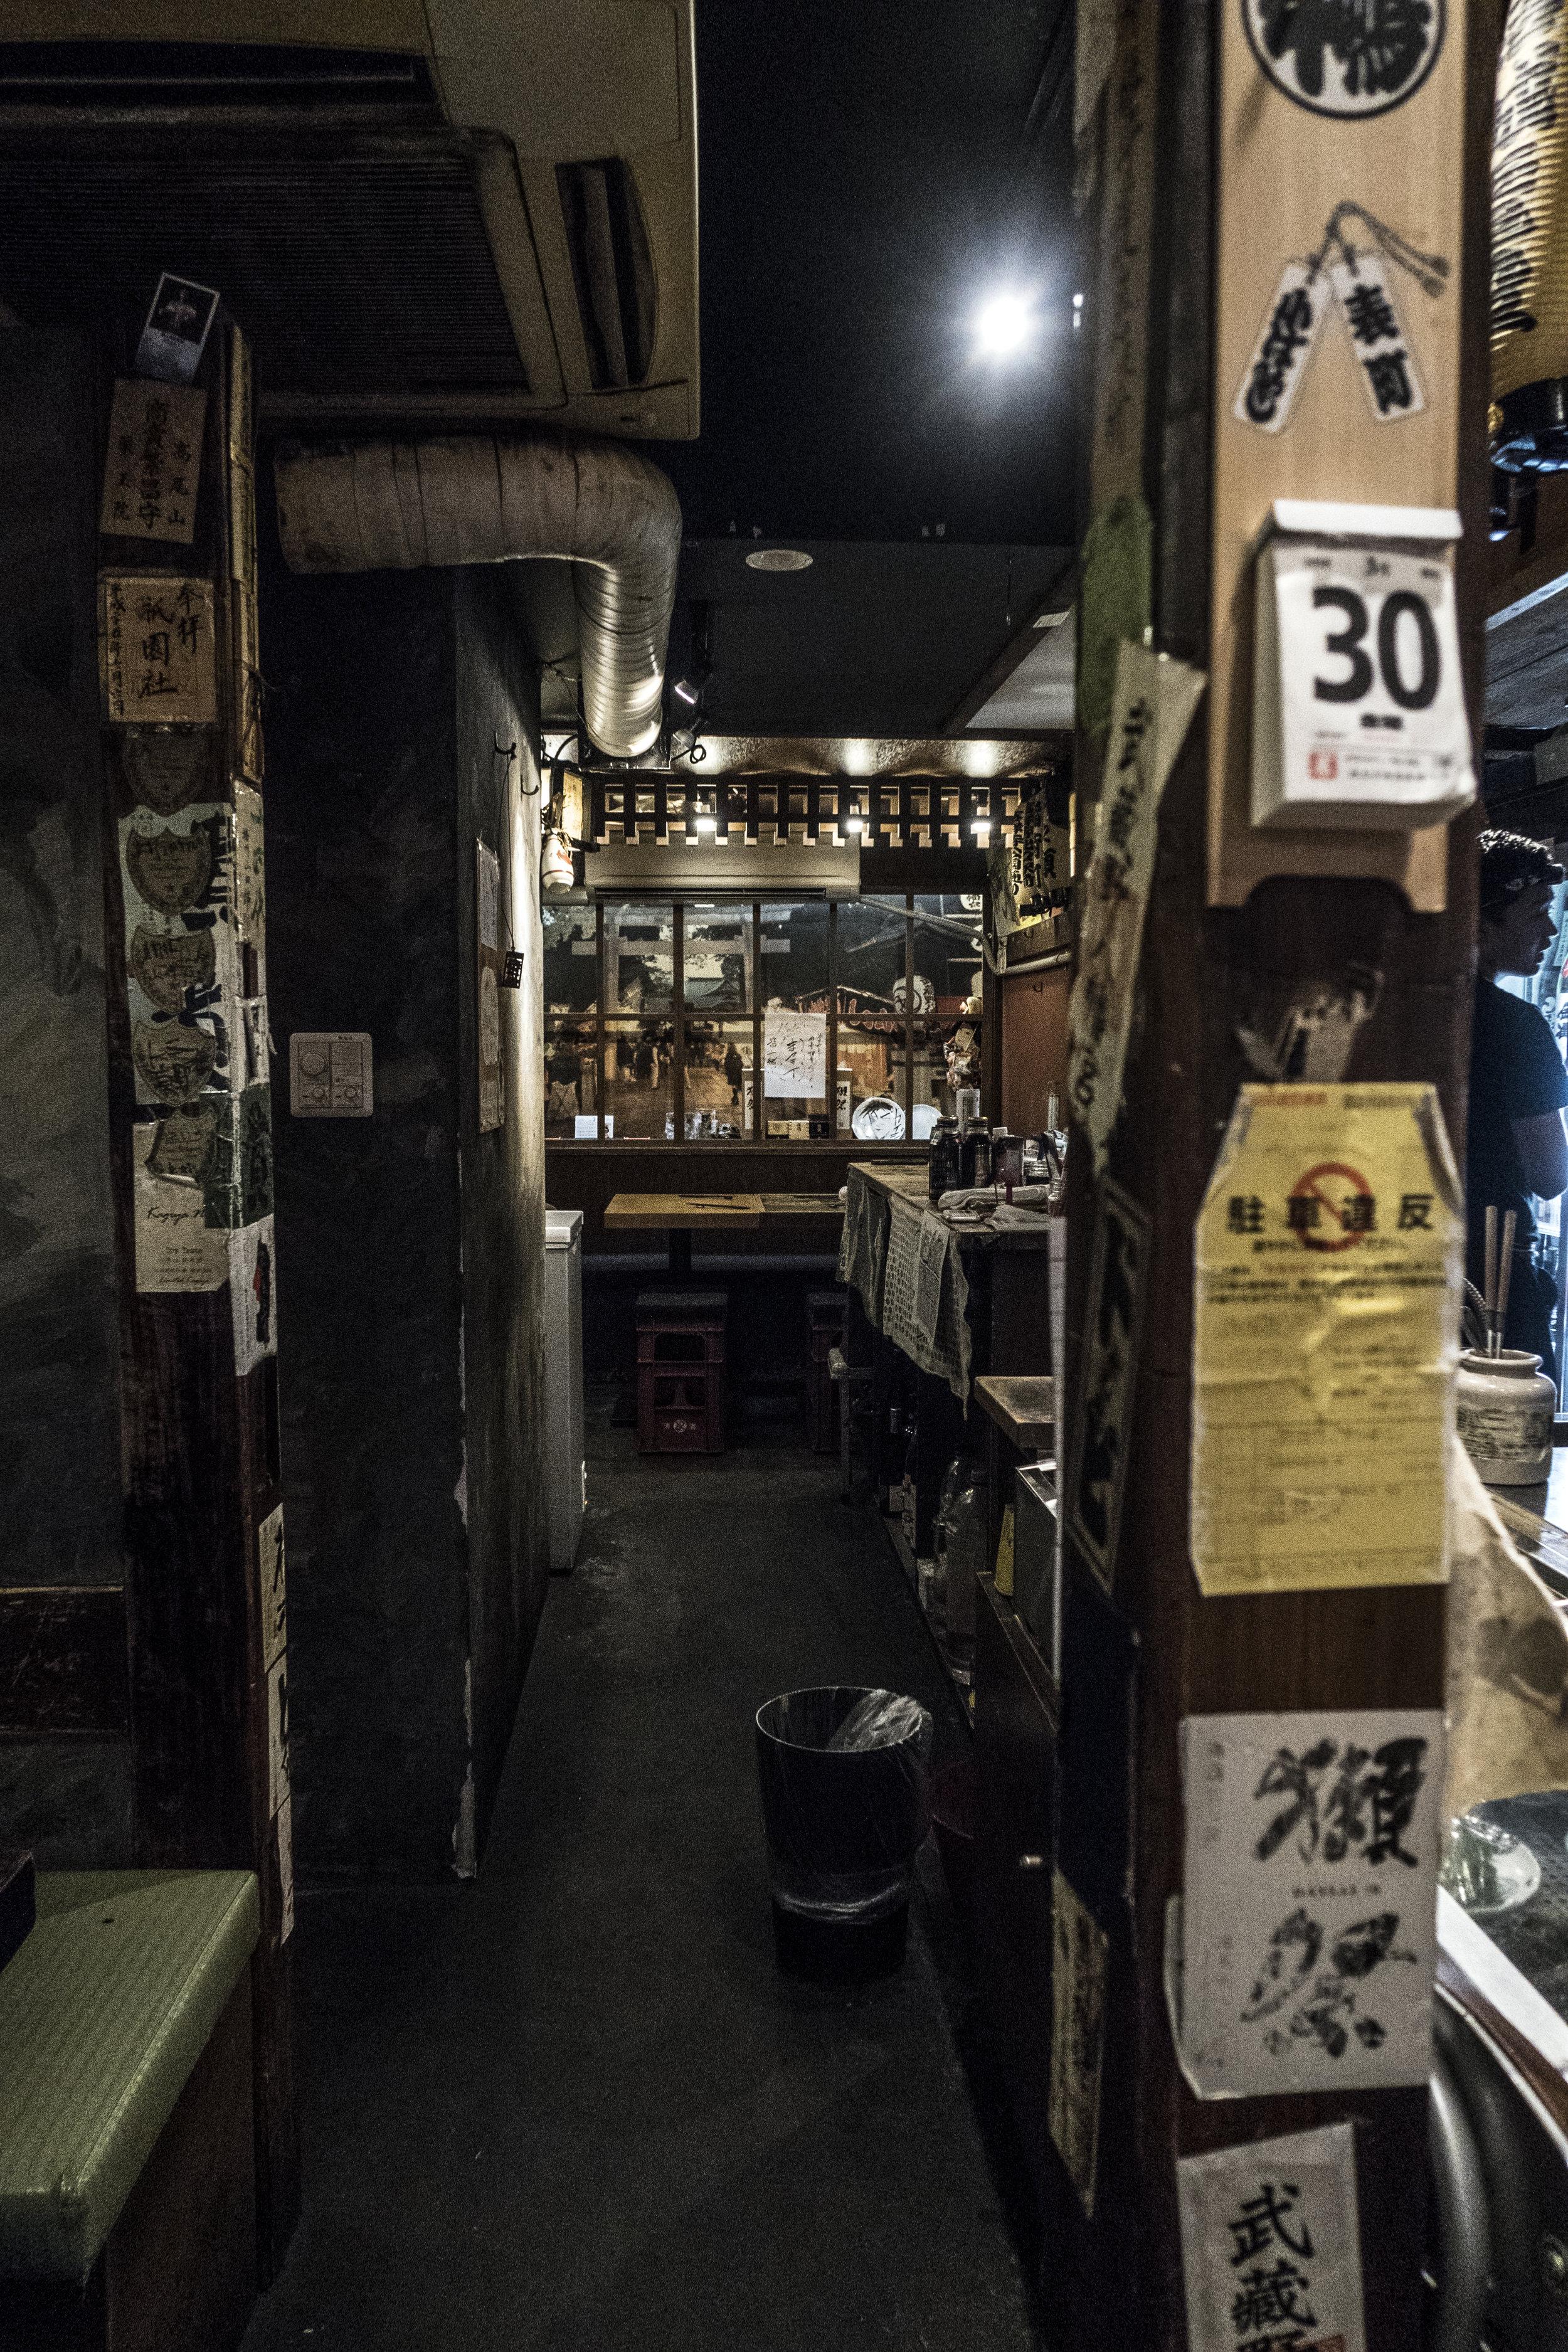 Bakawarai Kichijoji Izakaya inside